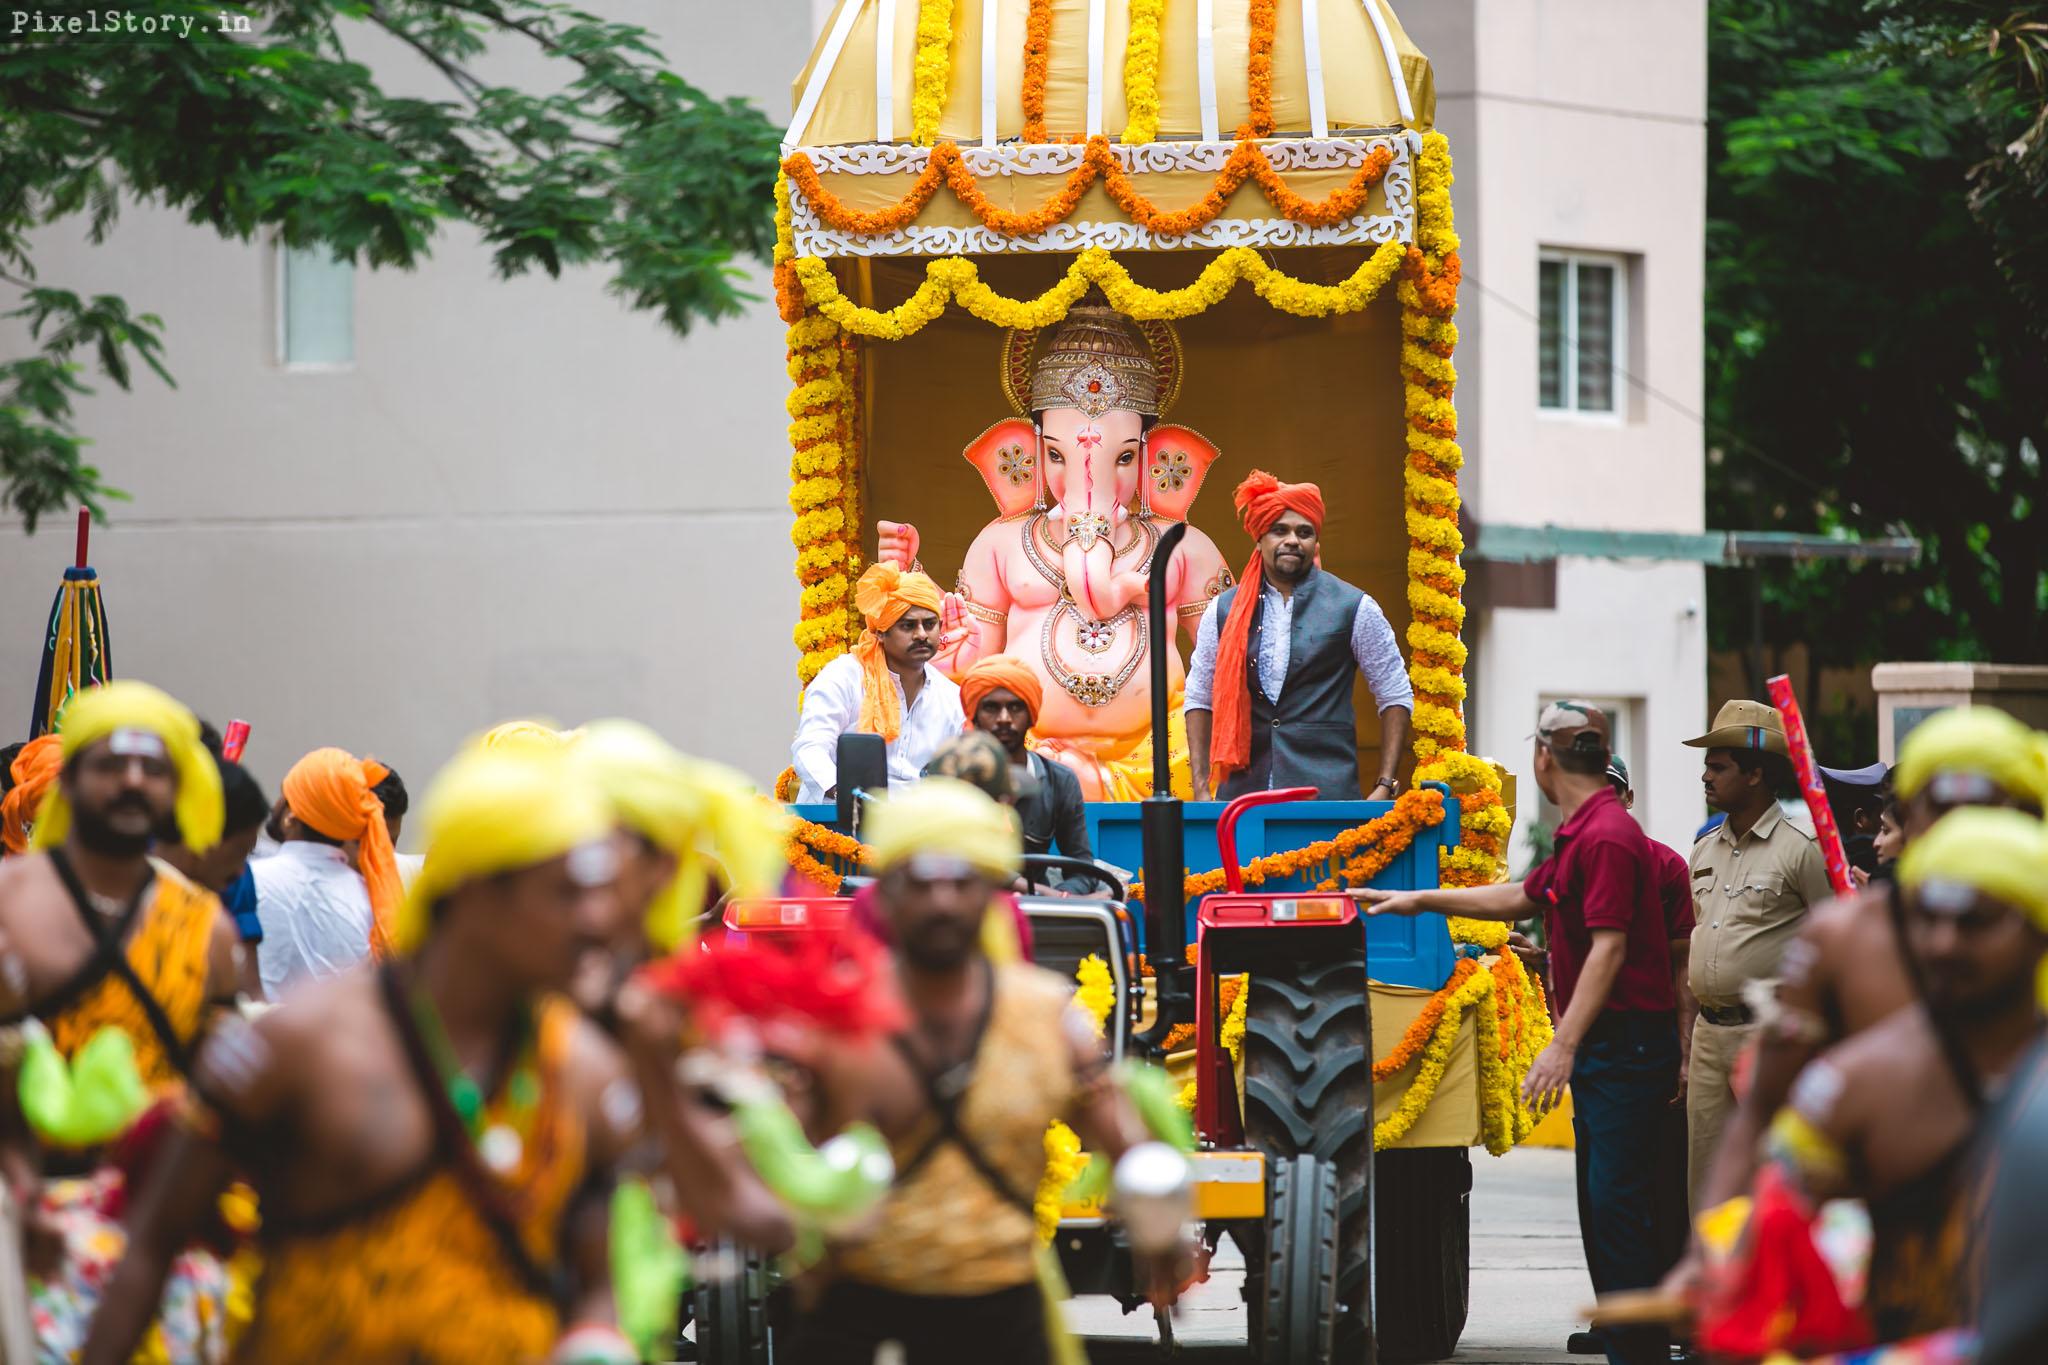 PixelStory-Ganesh-Utsav-2017-022.jpg